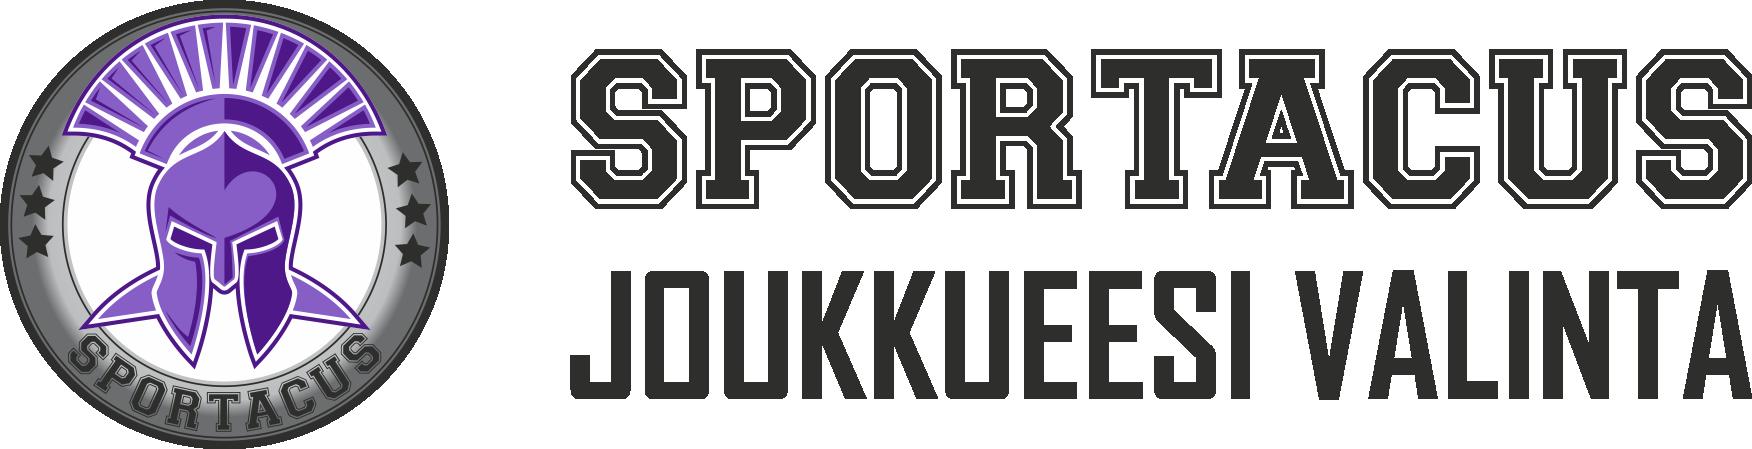 Teamfenix Oy - Sportacus.fi